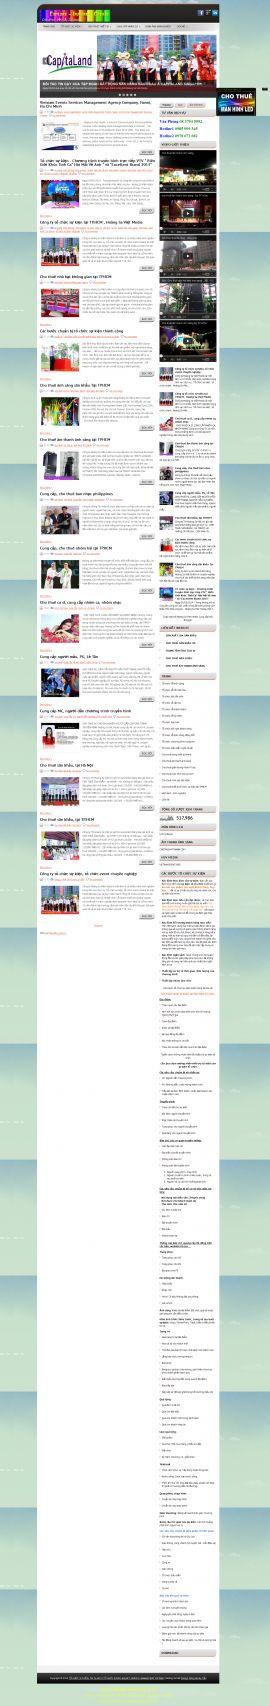 Mẫu website tổ chức sự kiện 10379